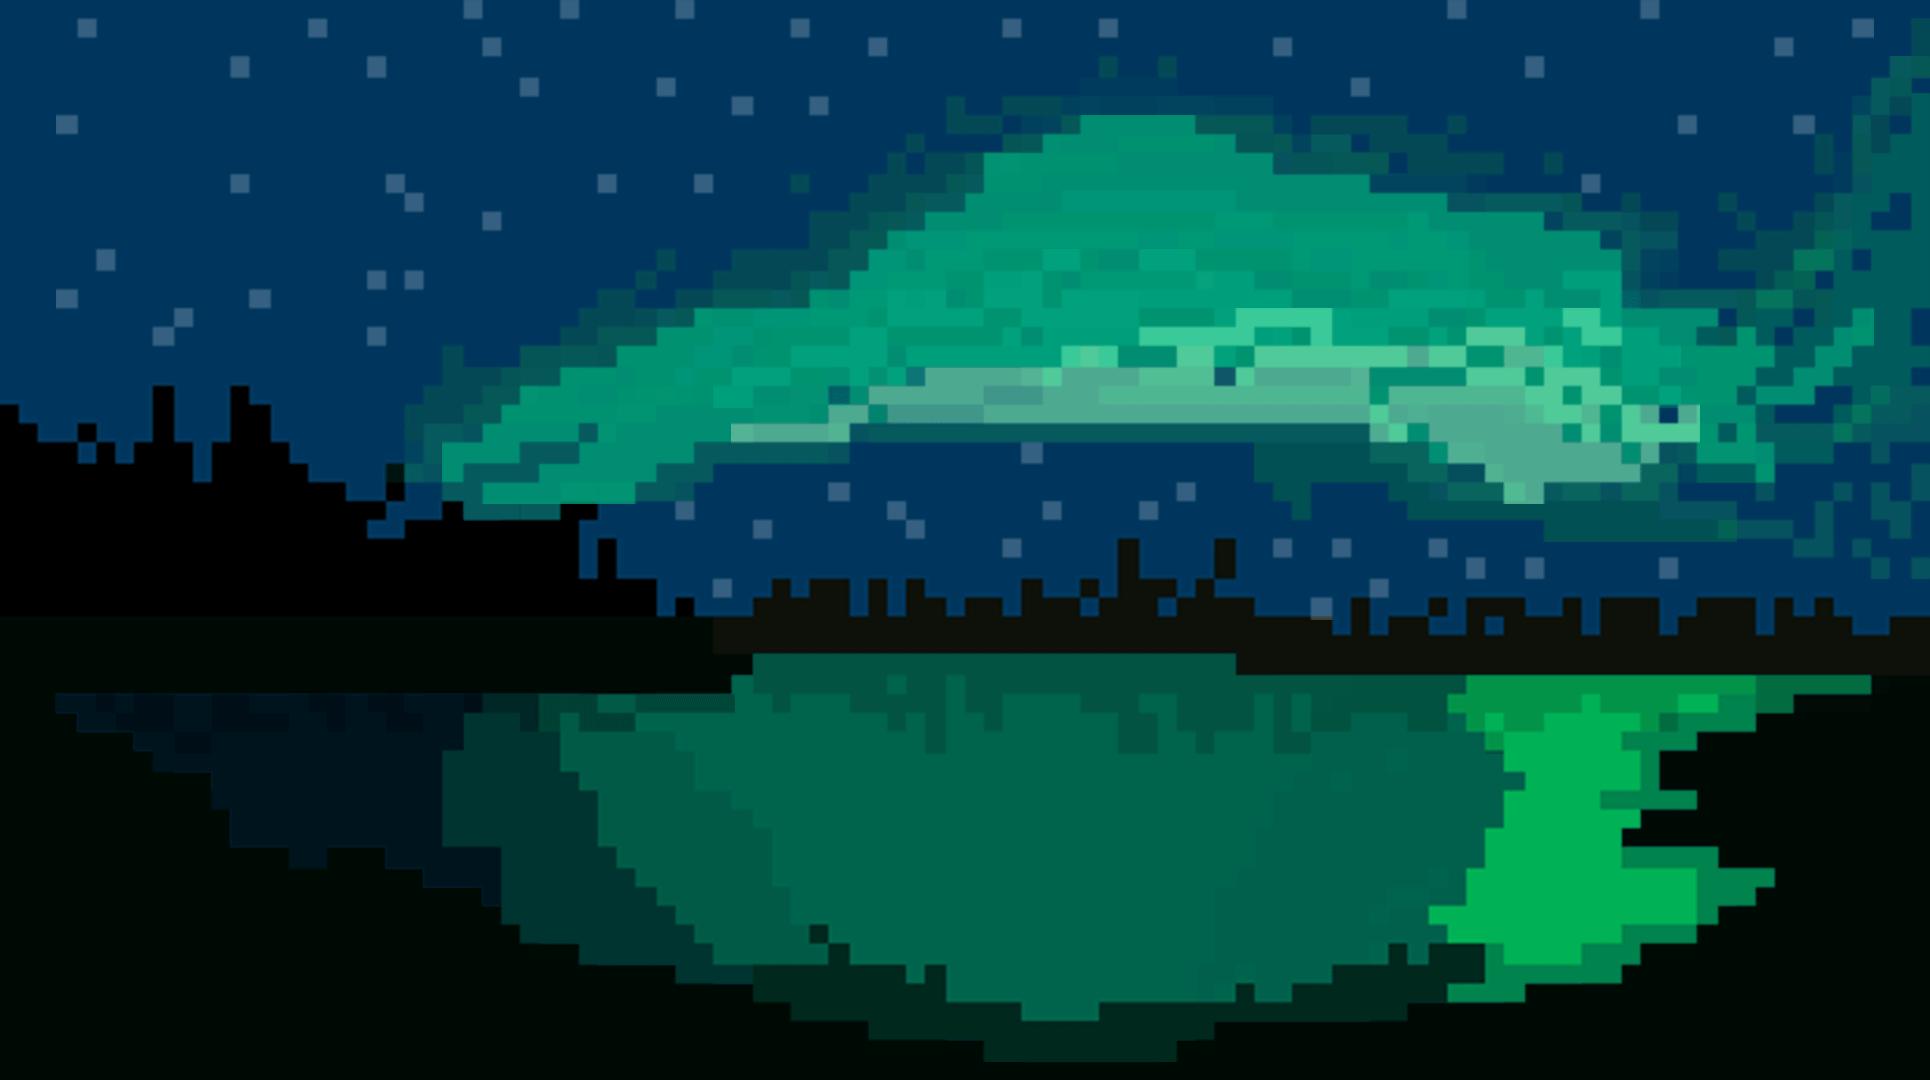 Northern Lights 8bit Art Style by JustFeDe on DeviantArt